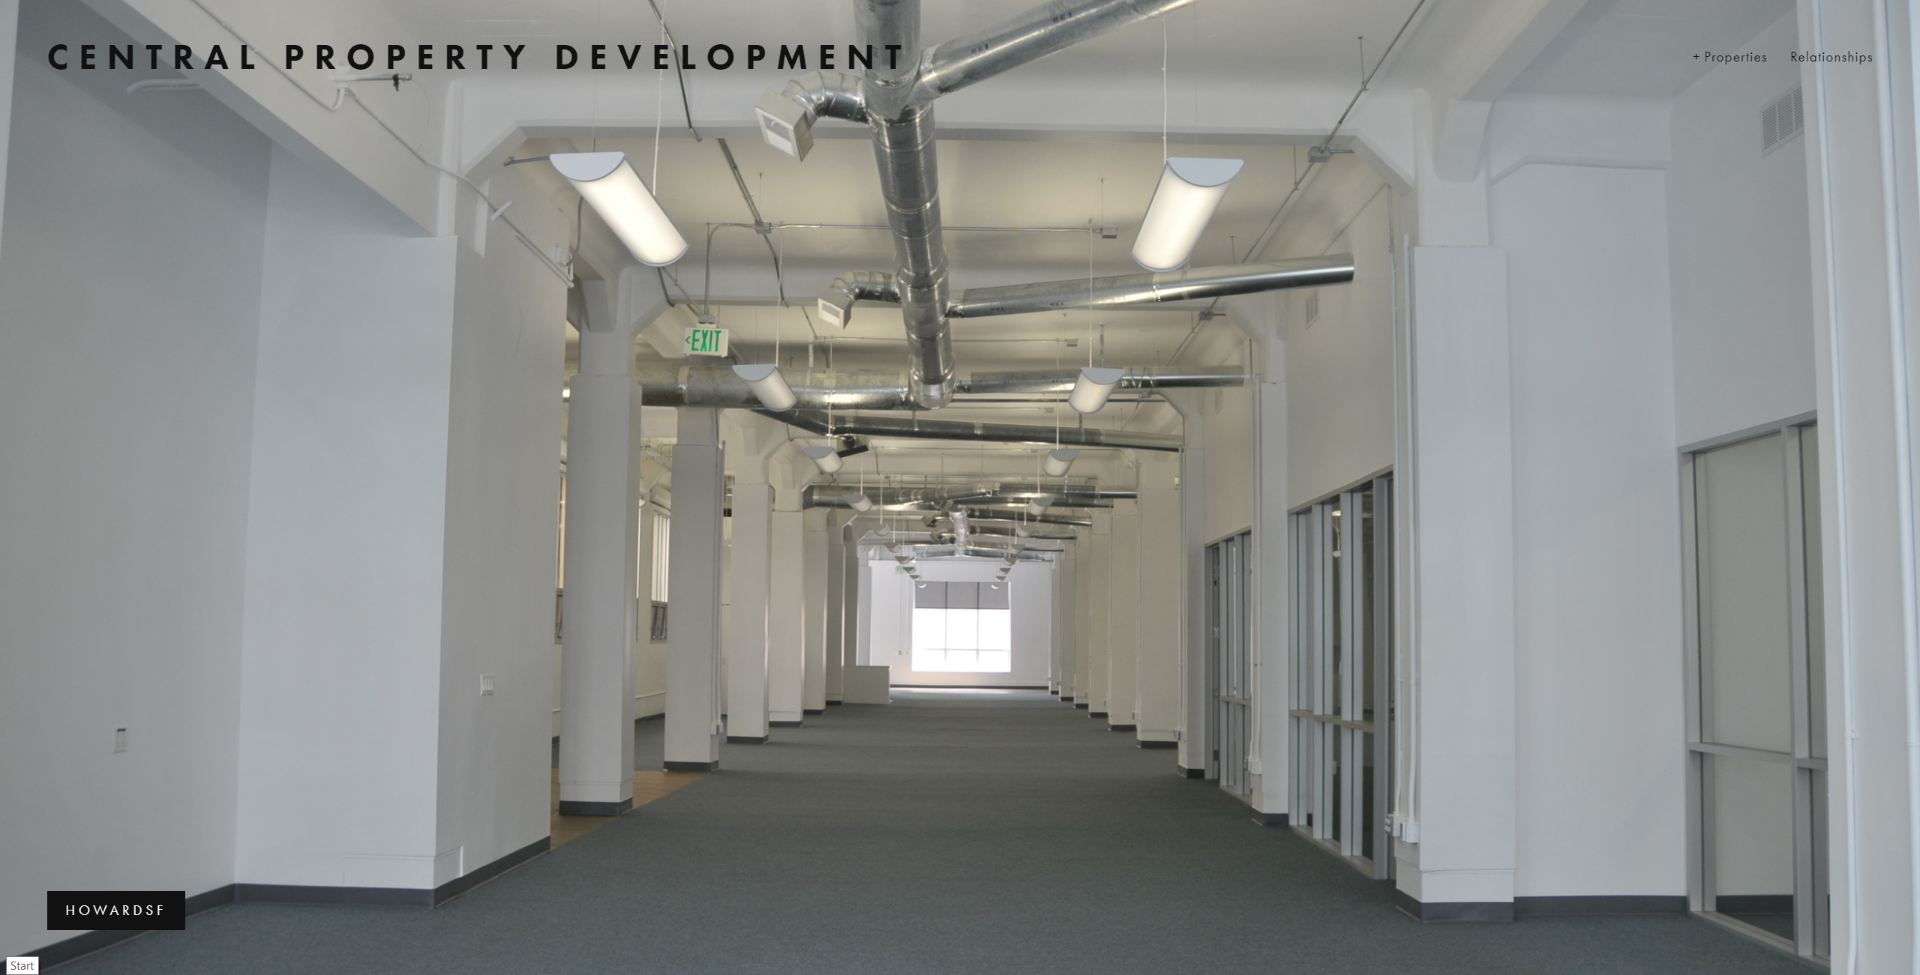 Central Property Development website